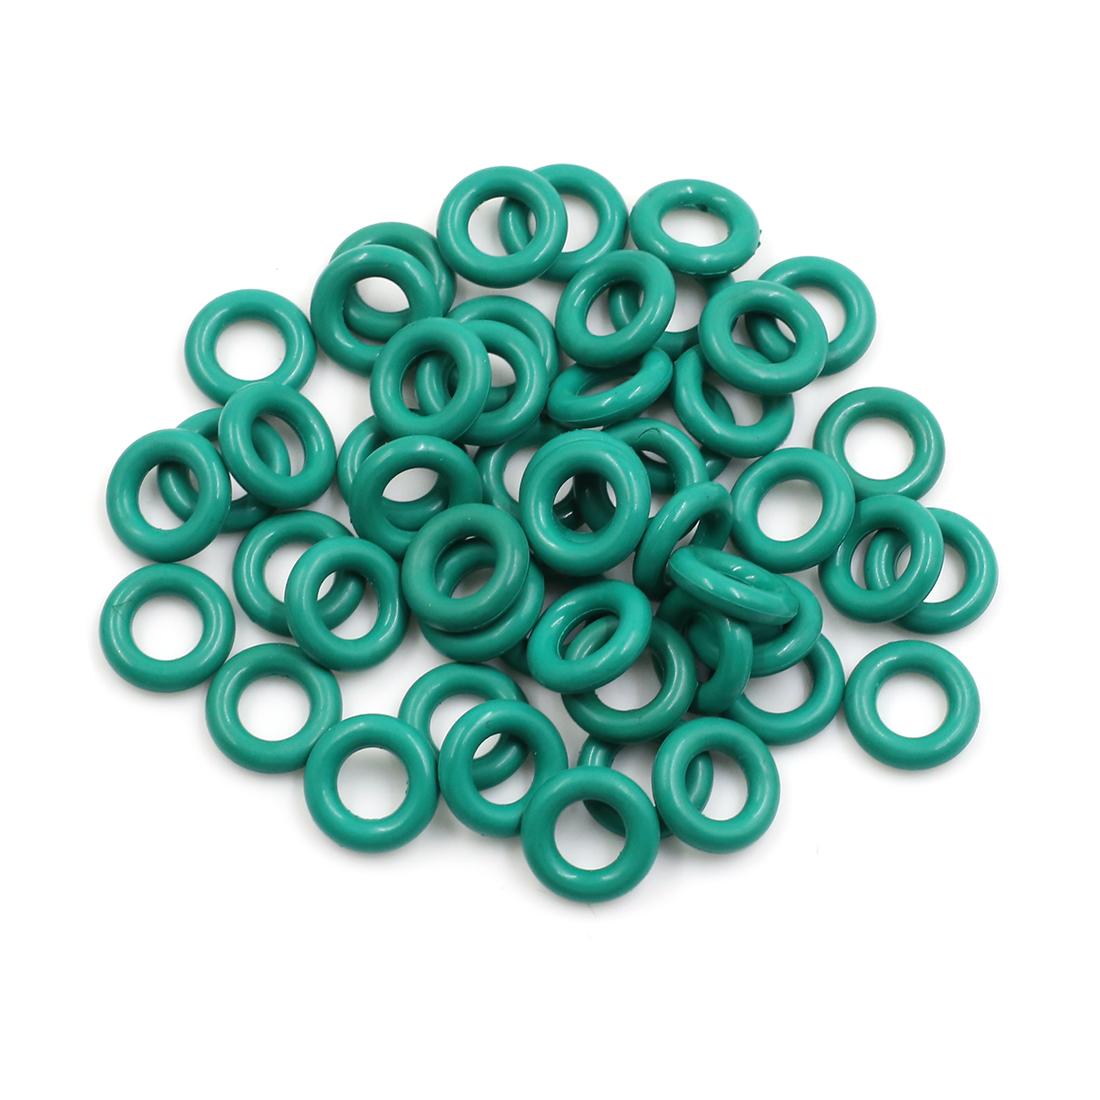 50pcs Green Universal FKM O-Ring Sealing Gasket Washer for Car 14mm x 3.5mm